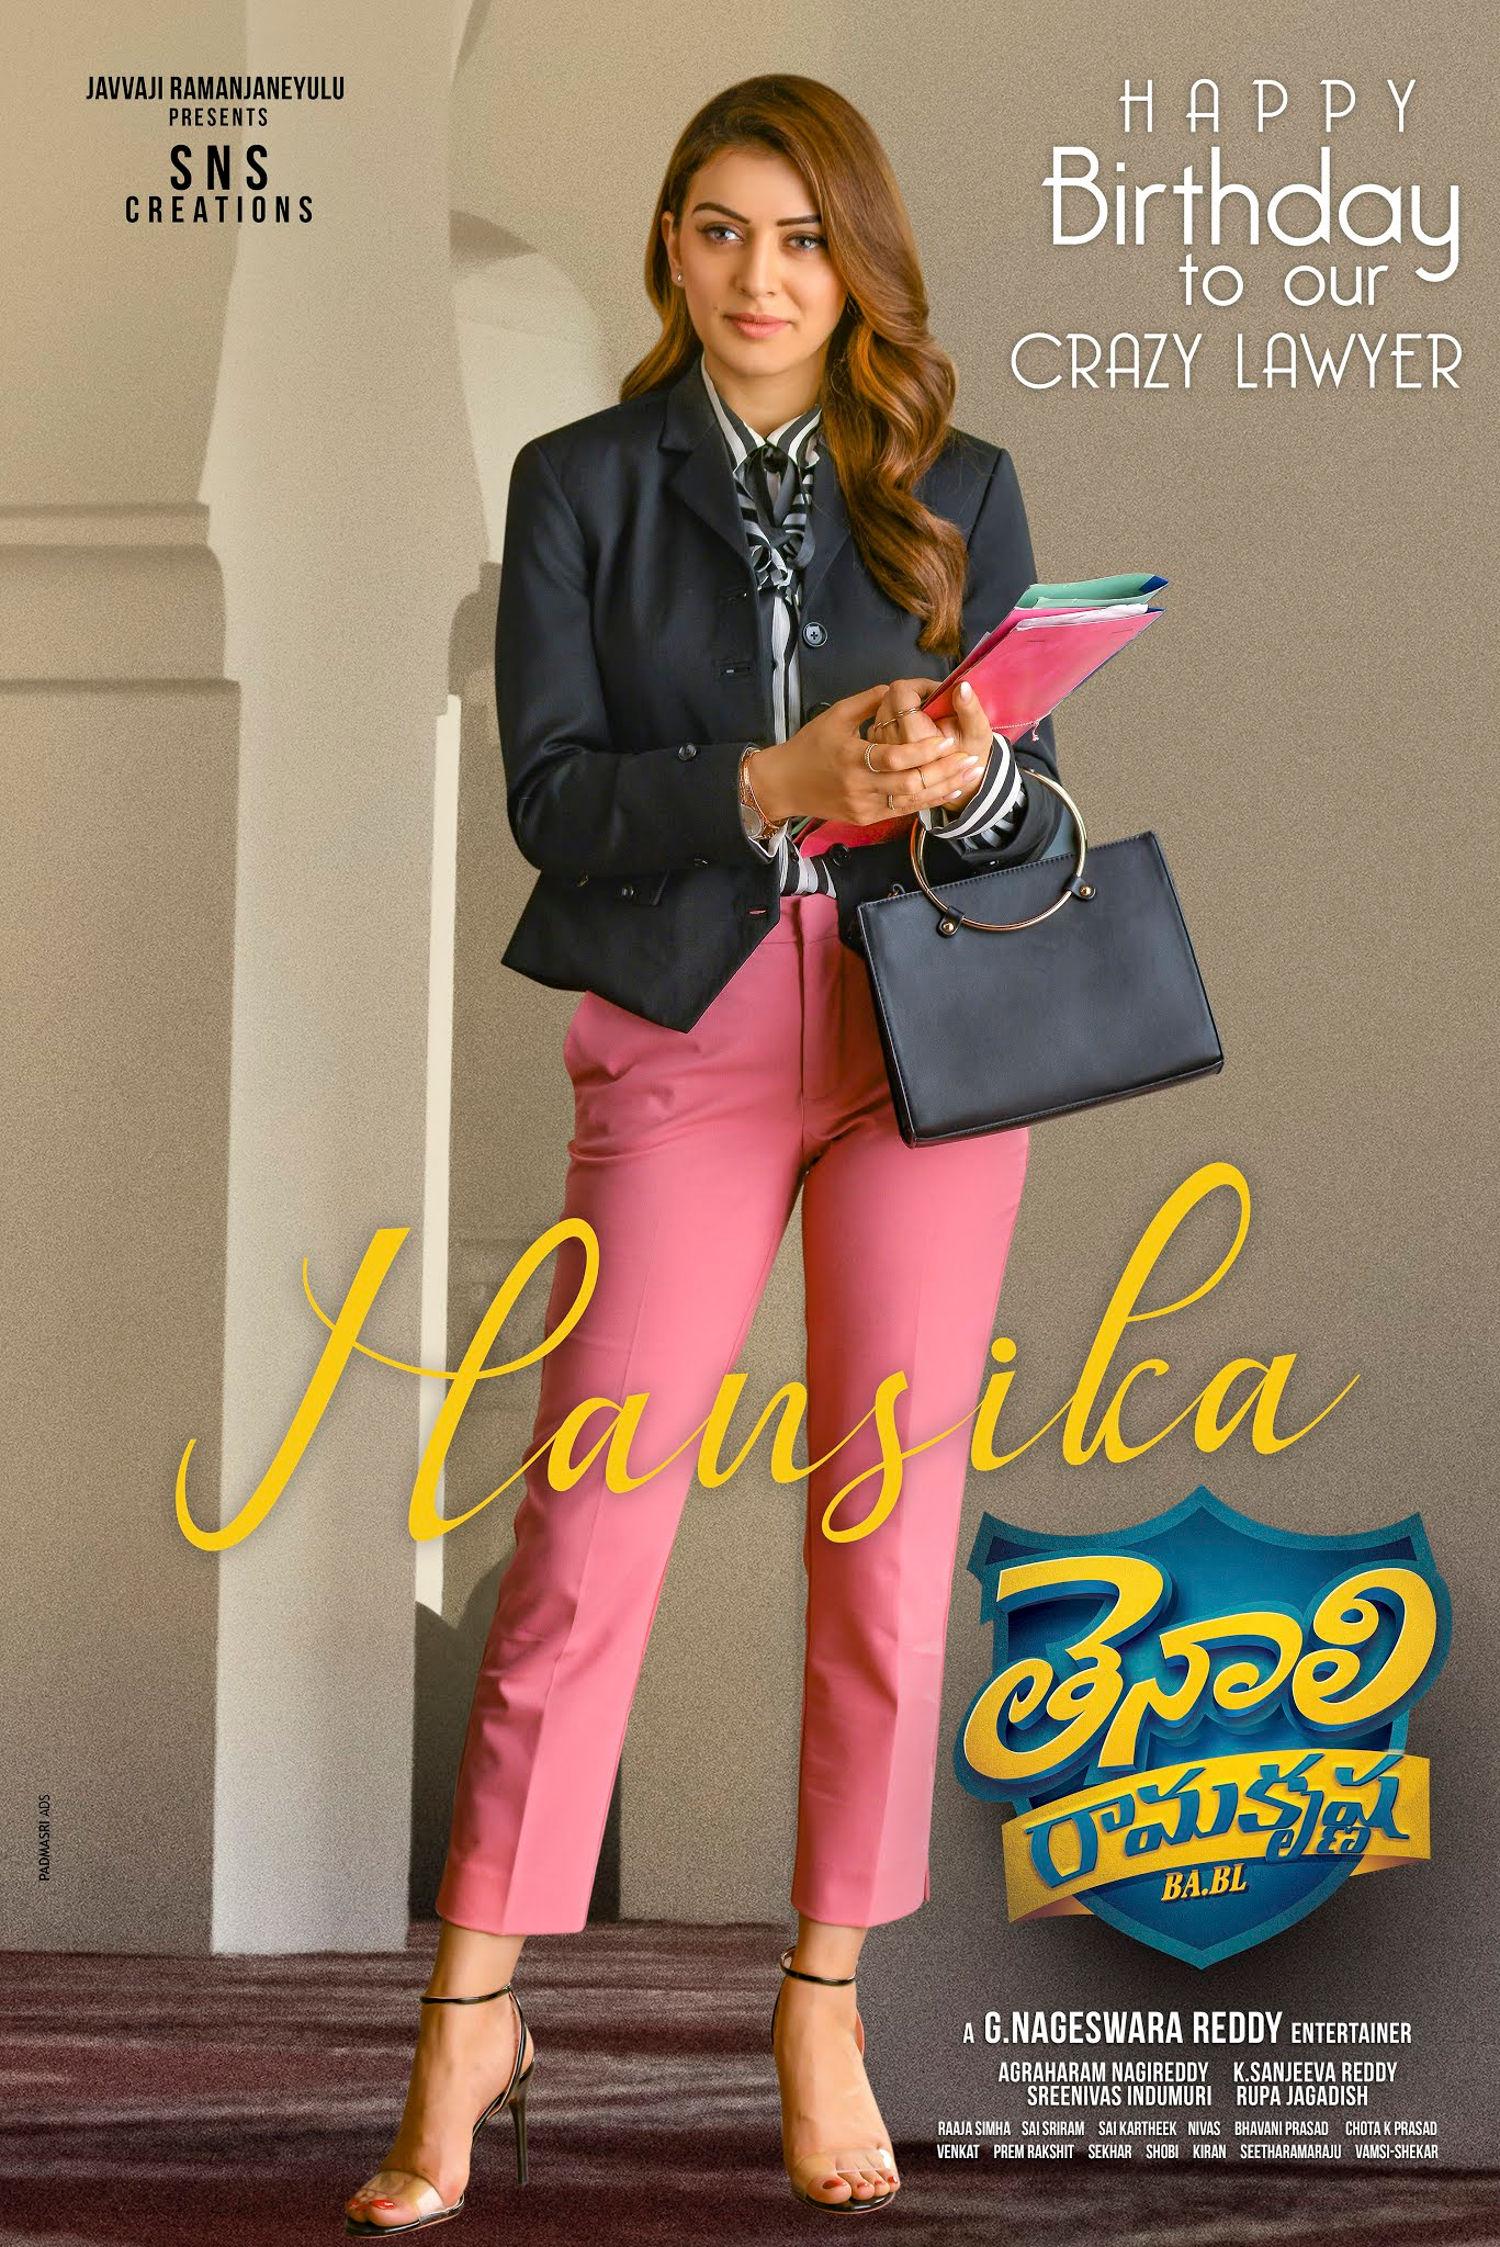 Tenali Ramakrishna BA BL Heroine Hansika Motwani Birthday Special Poster HD